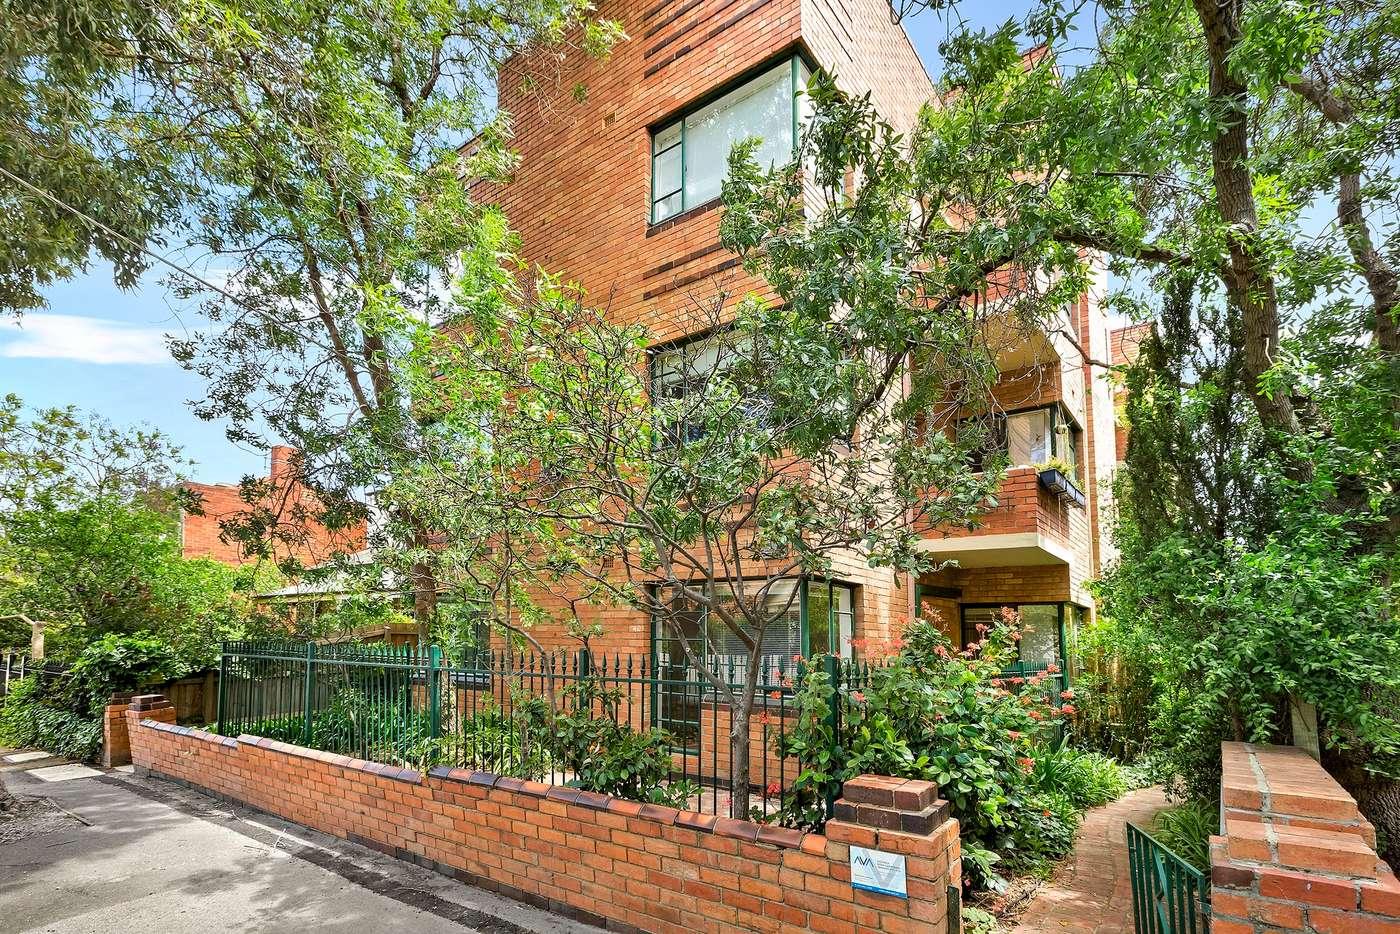 Main view of Homely apartment listing, 5/40 Burnett Street, St Kilda VIC 3182